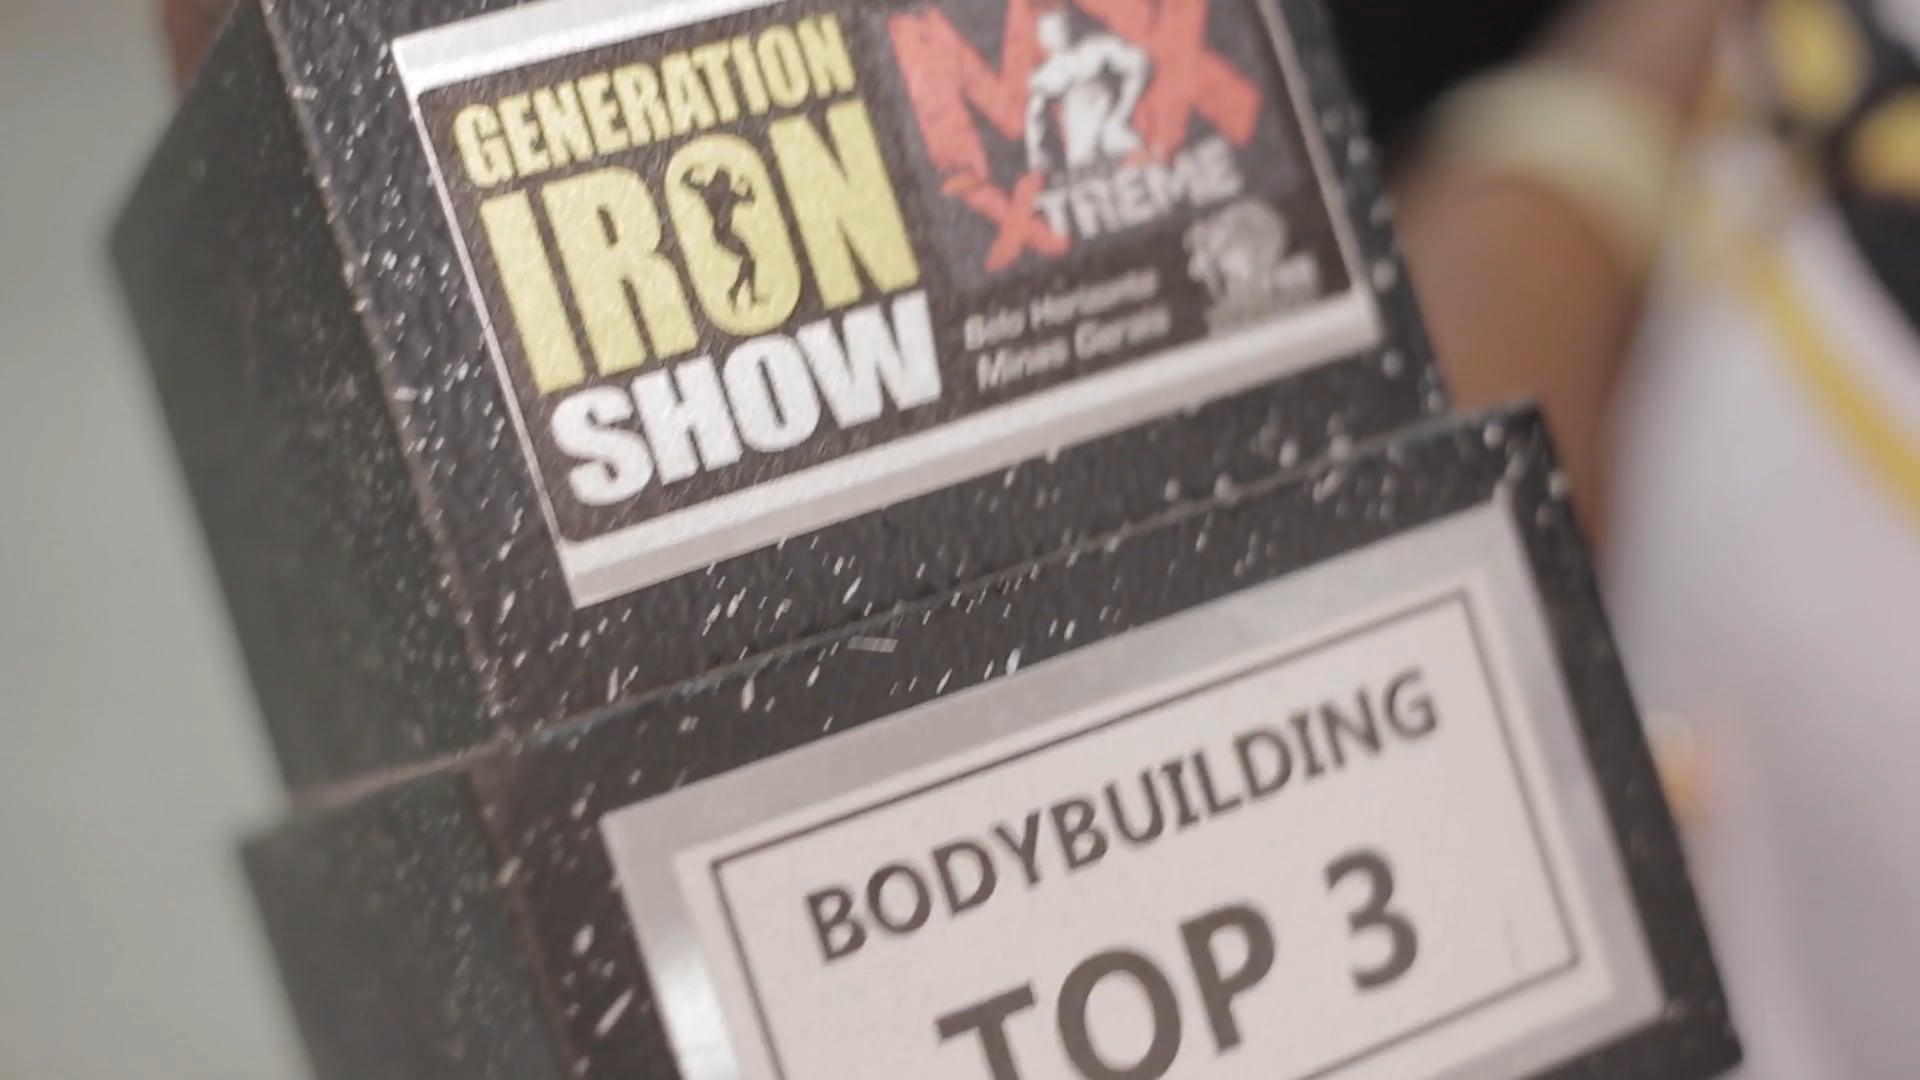 Generation Iron Show | 2019 - Academia Body Energy